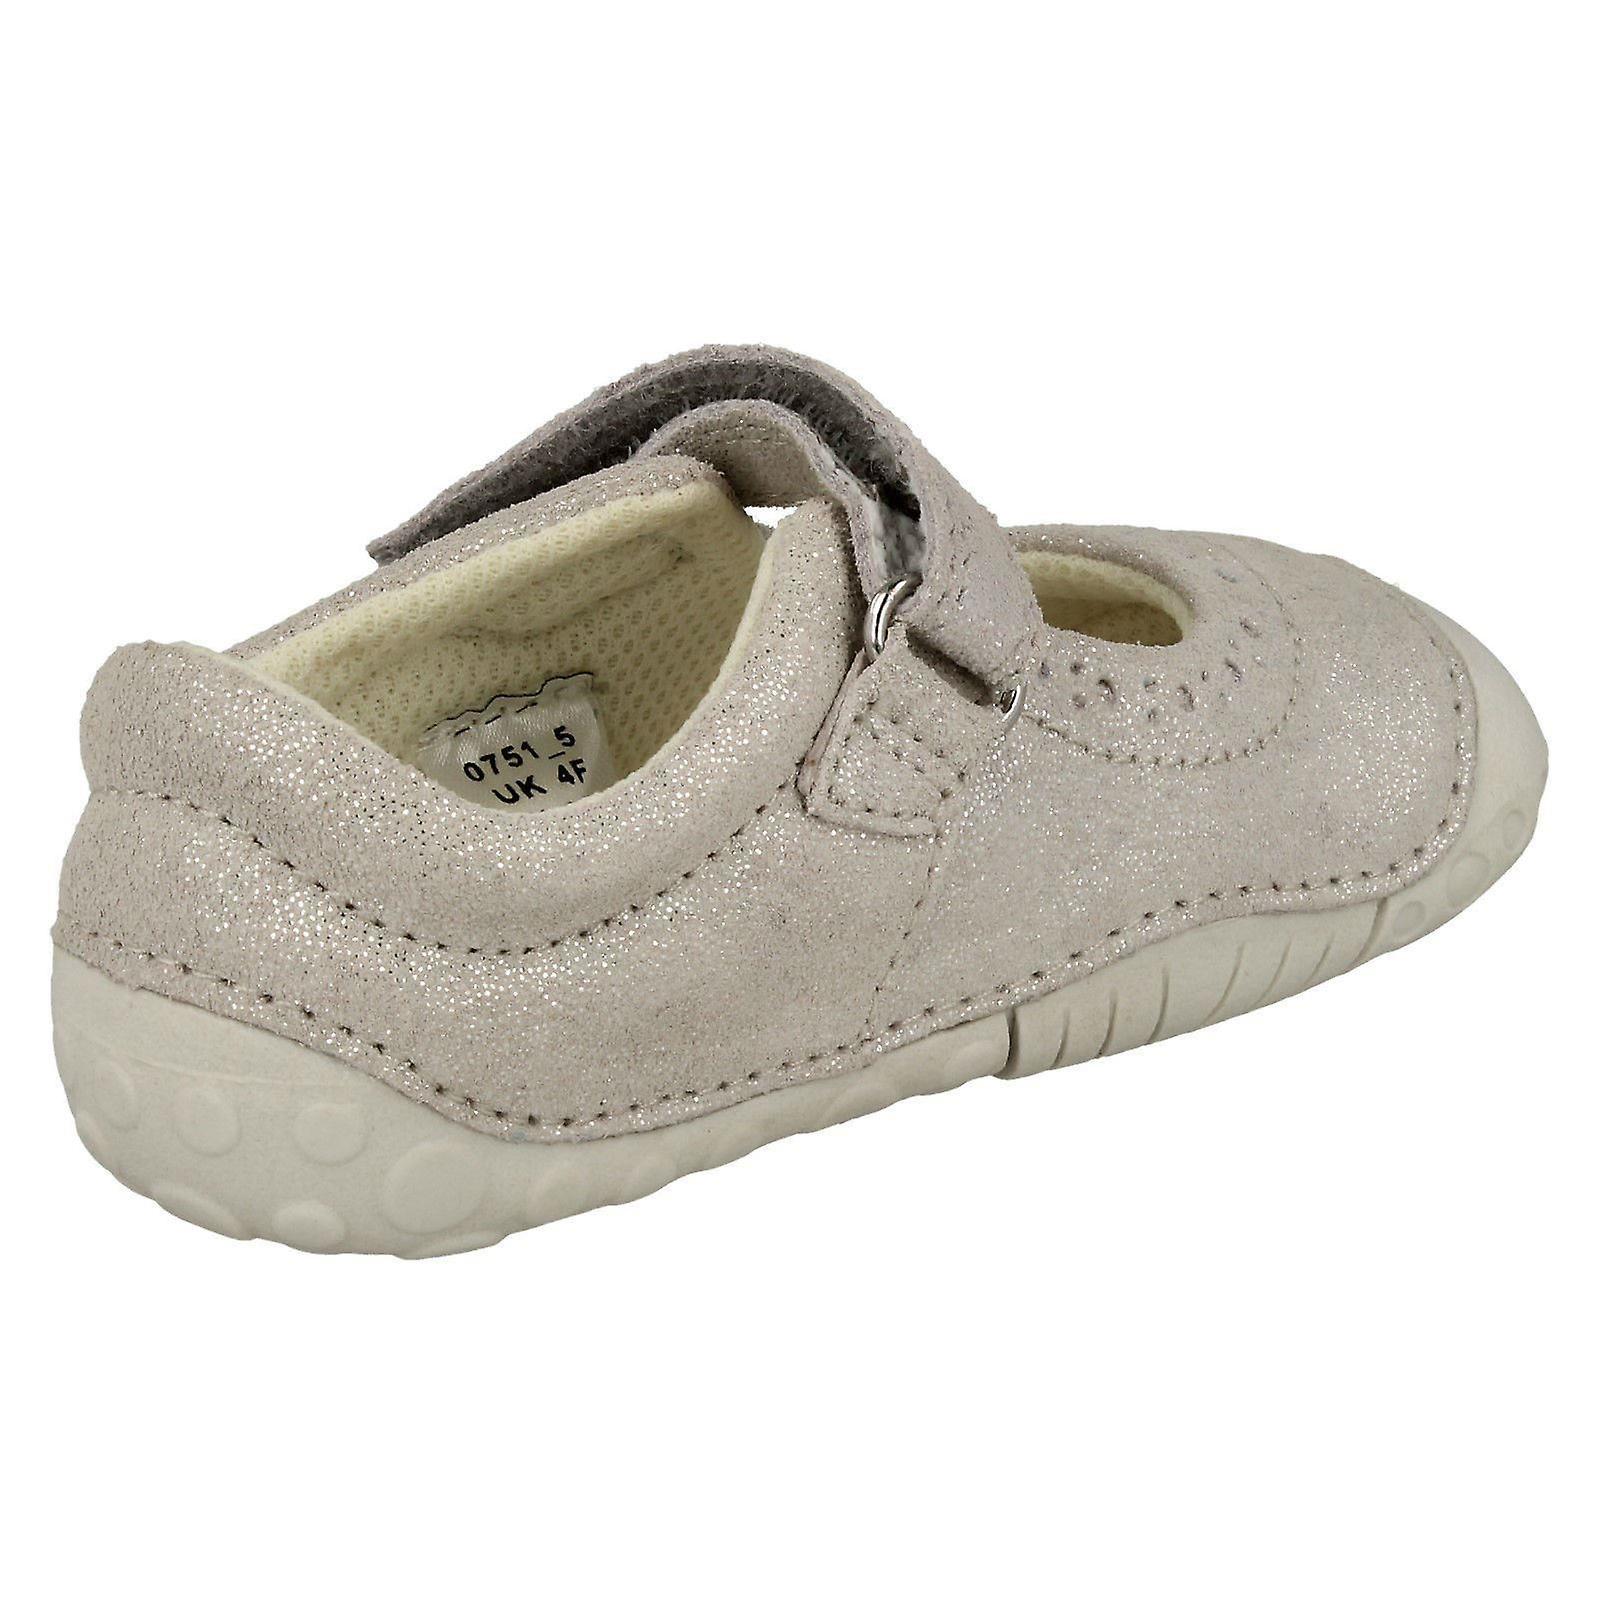 Girls Girls Girls Startrite Casual Shoes Cruise - Silver Nubuck - UK Size 3.5F - EU Size 19.5 - US Size 4.5 cc70b1